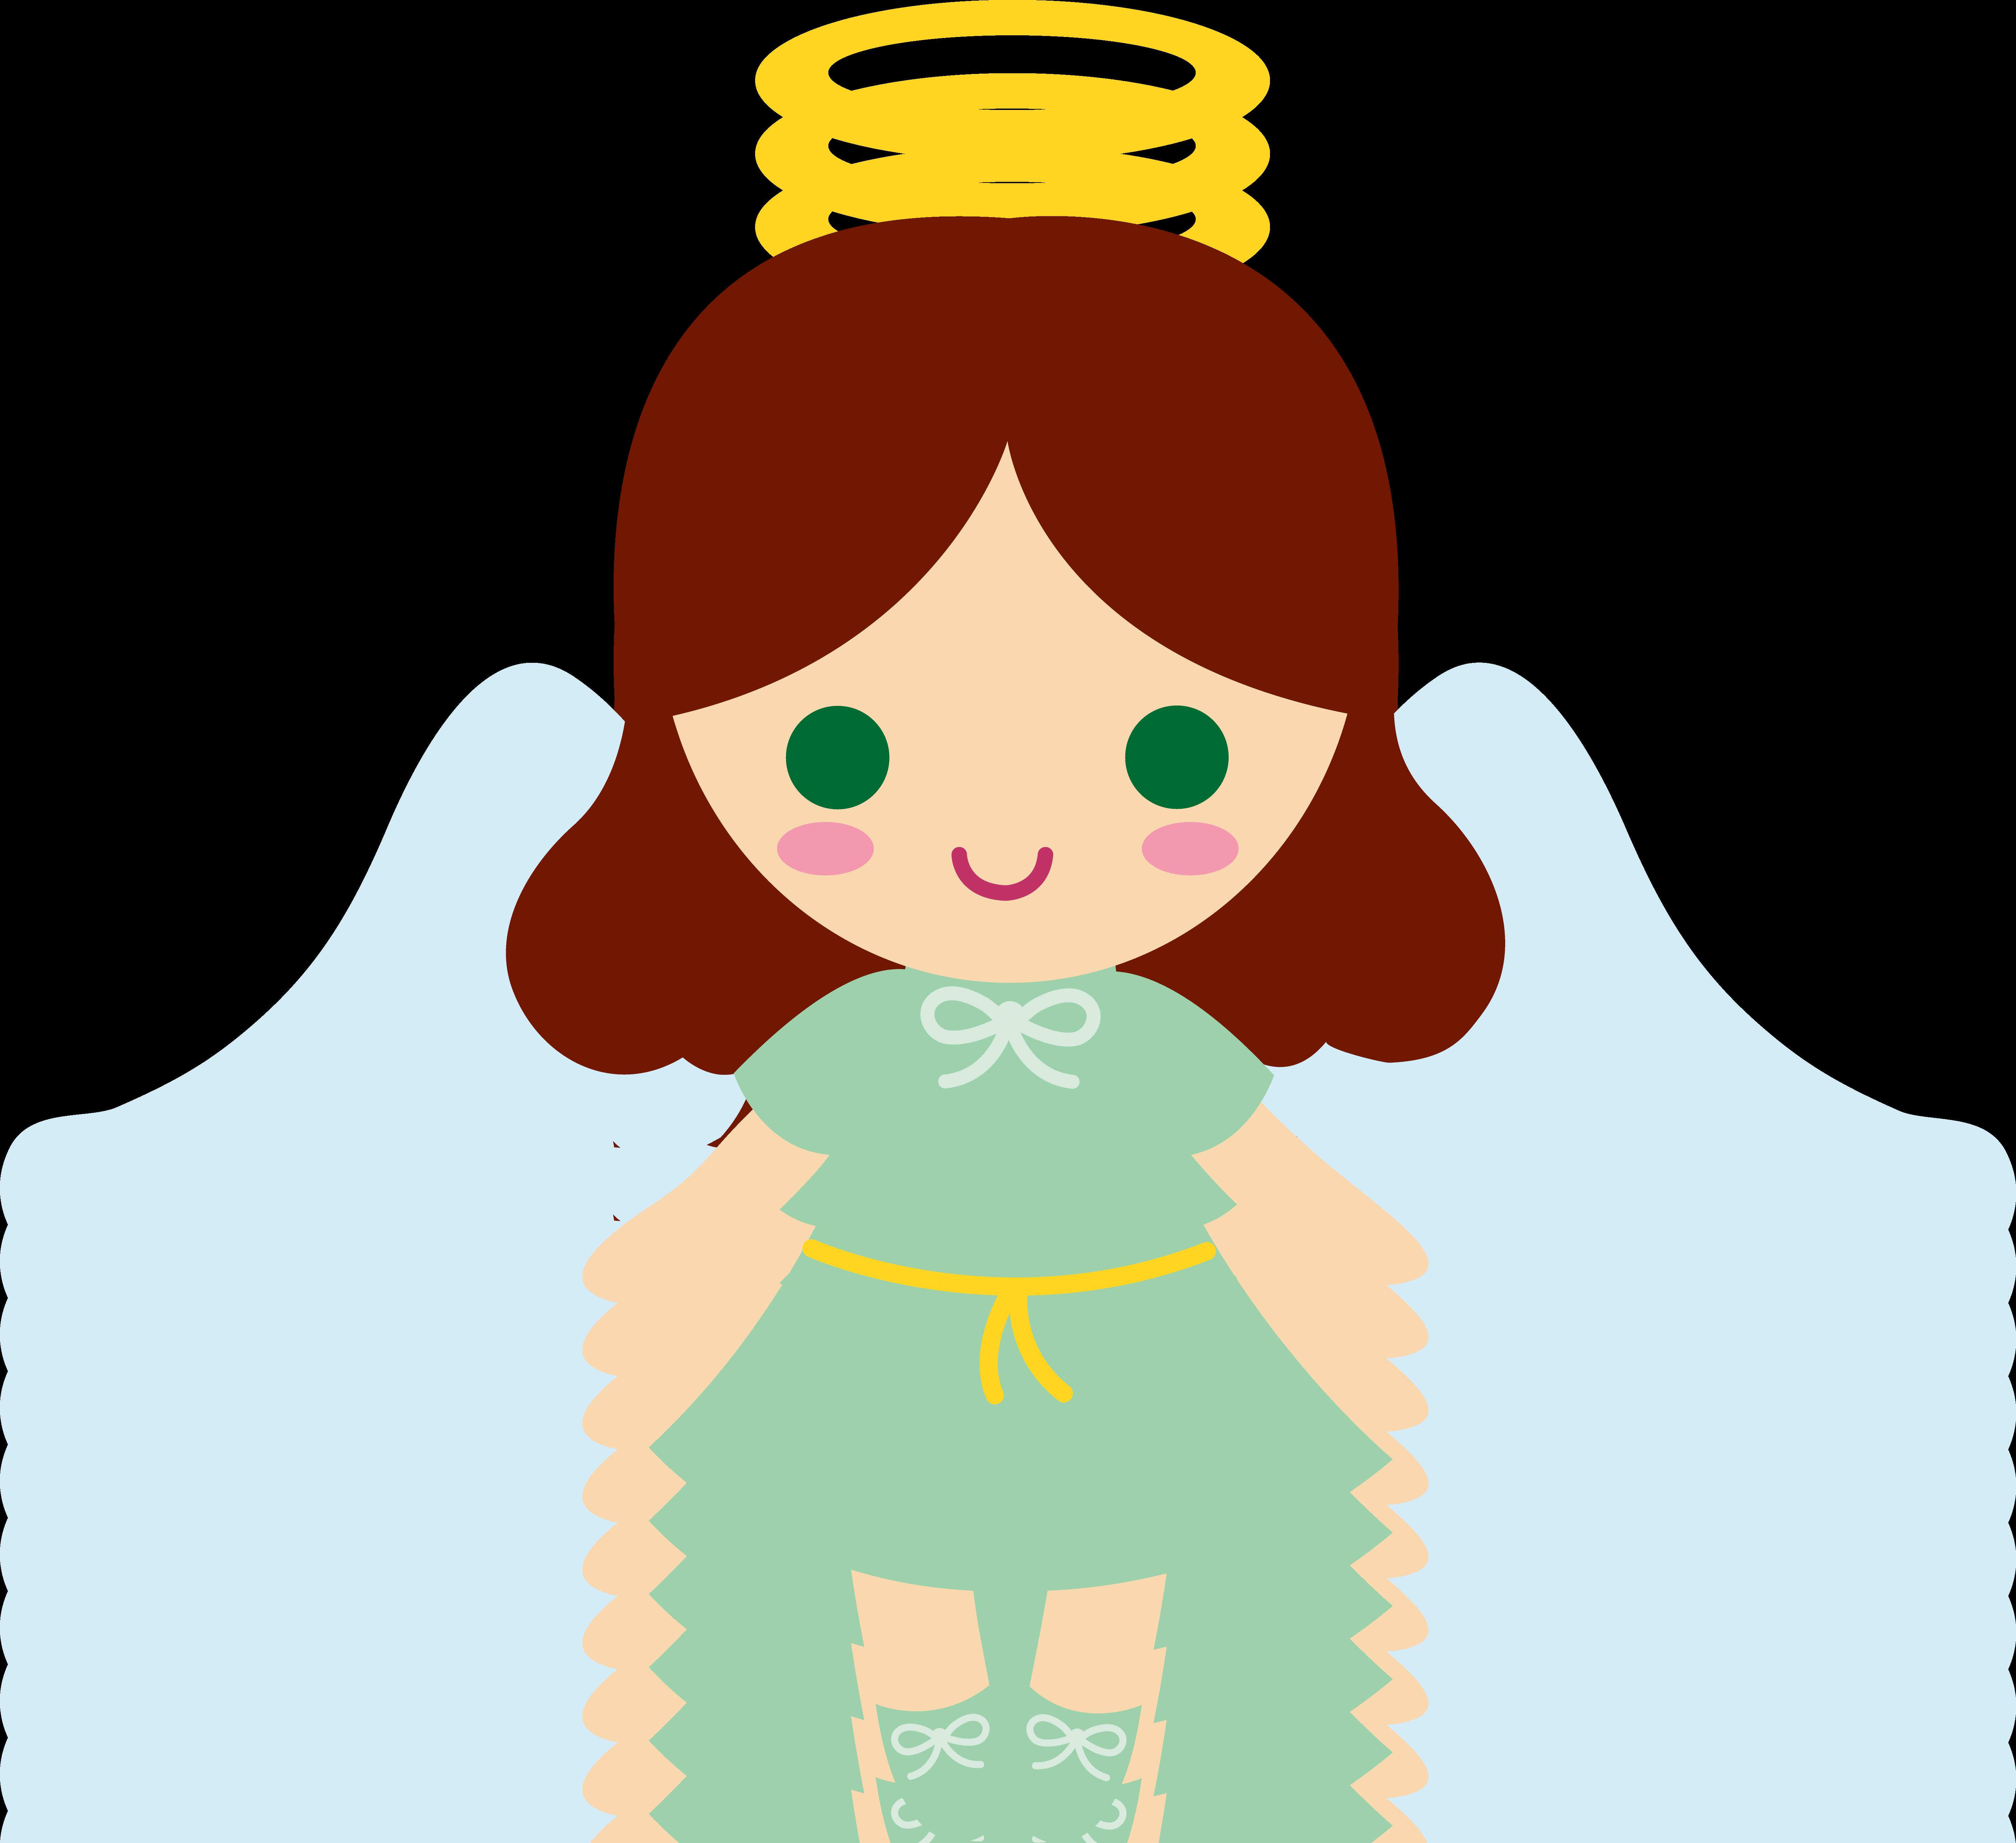 Bing clipart free cartoon angel jpg library Cartoon Angels Group with 47+ items jpg library